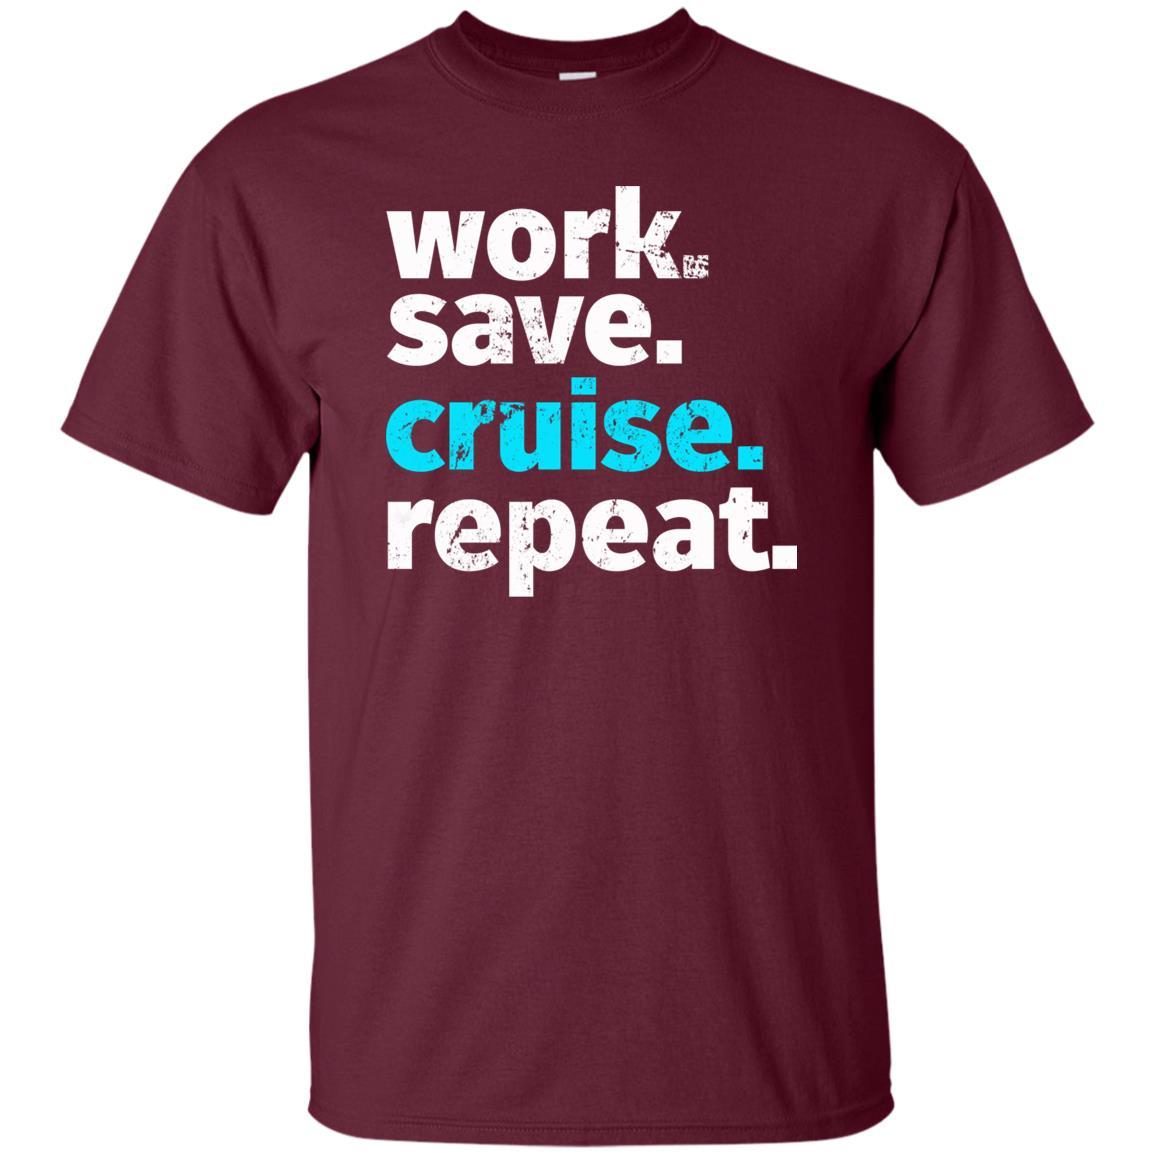 Funny Cruise Sayings Tee Work Save Cruise Repeat Unisex Short Sleeve